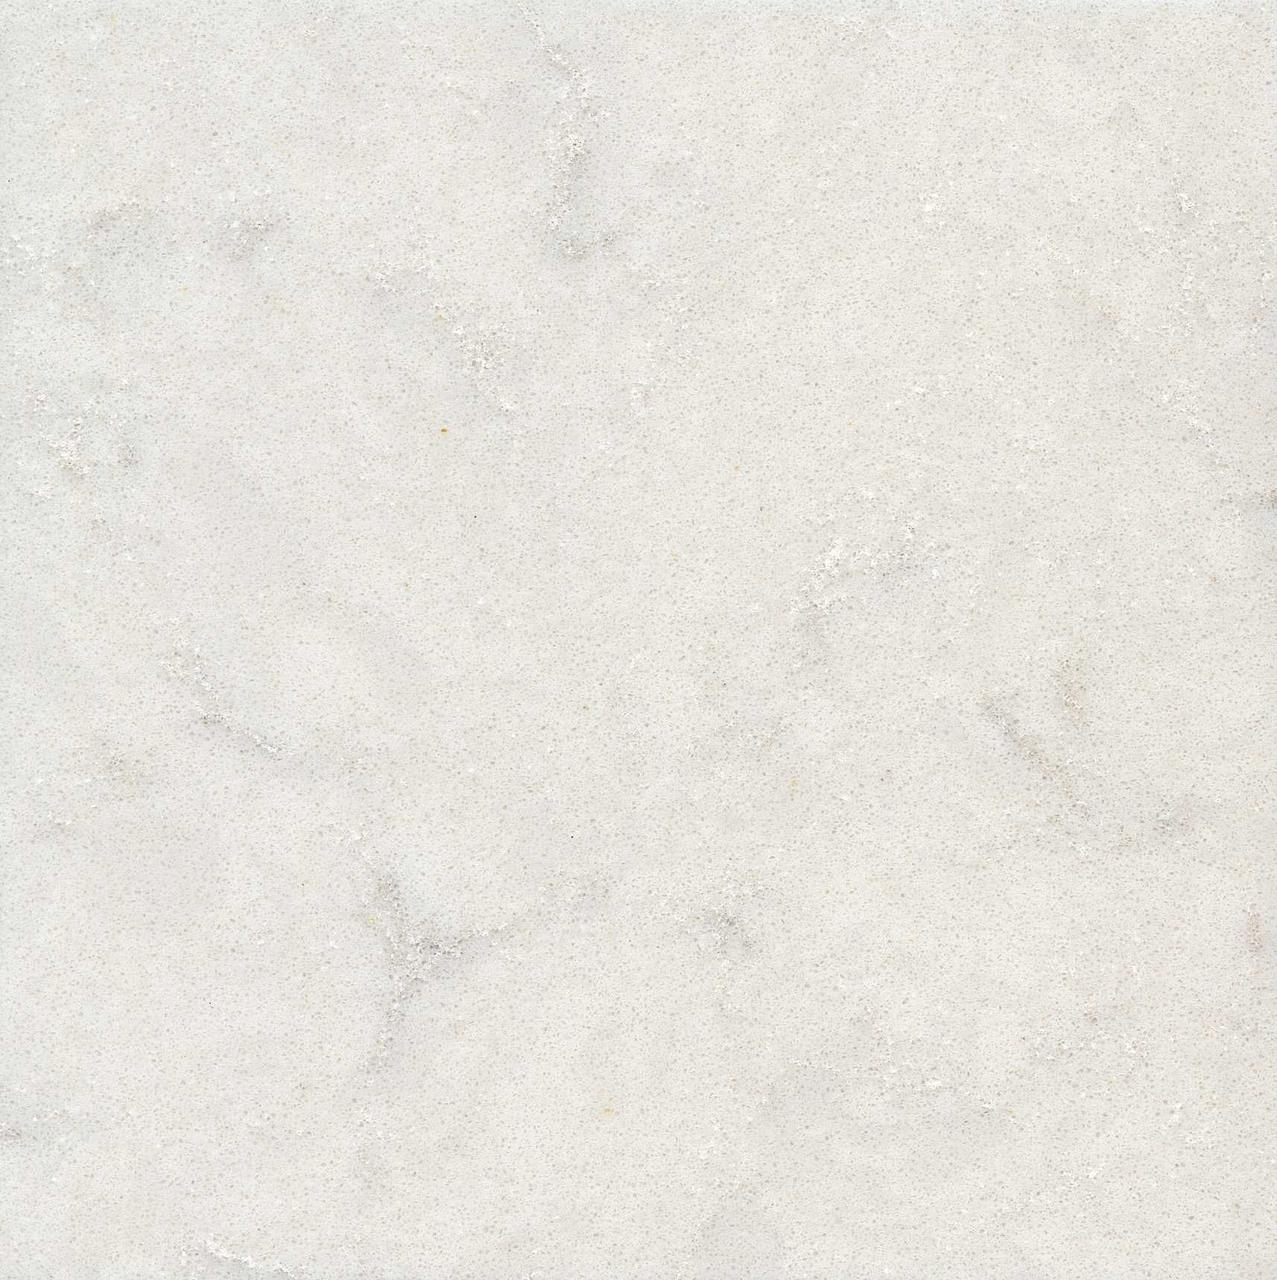 Искусственный камень, Кварц Silestone Lagoon 20 мм